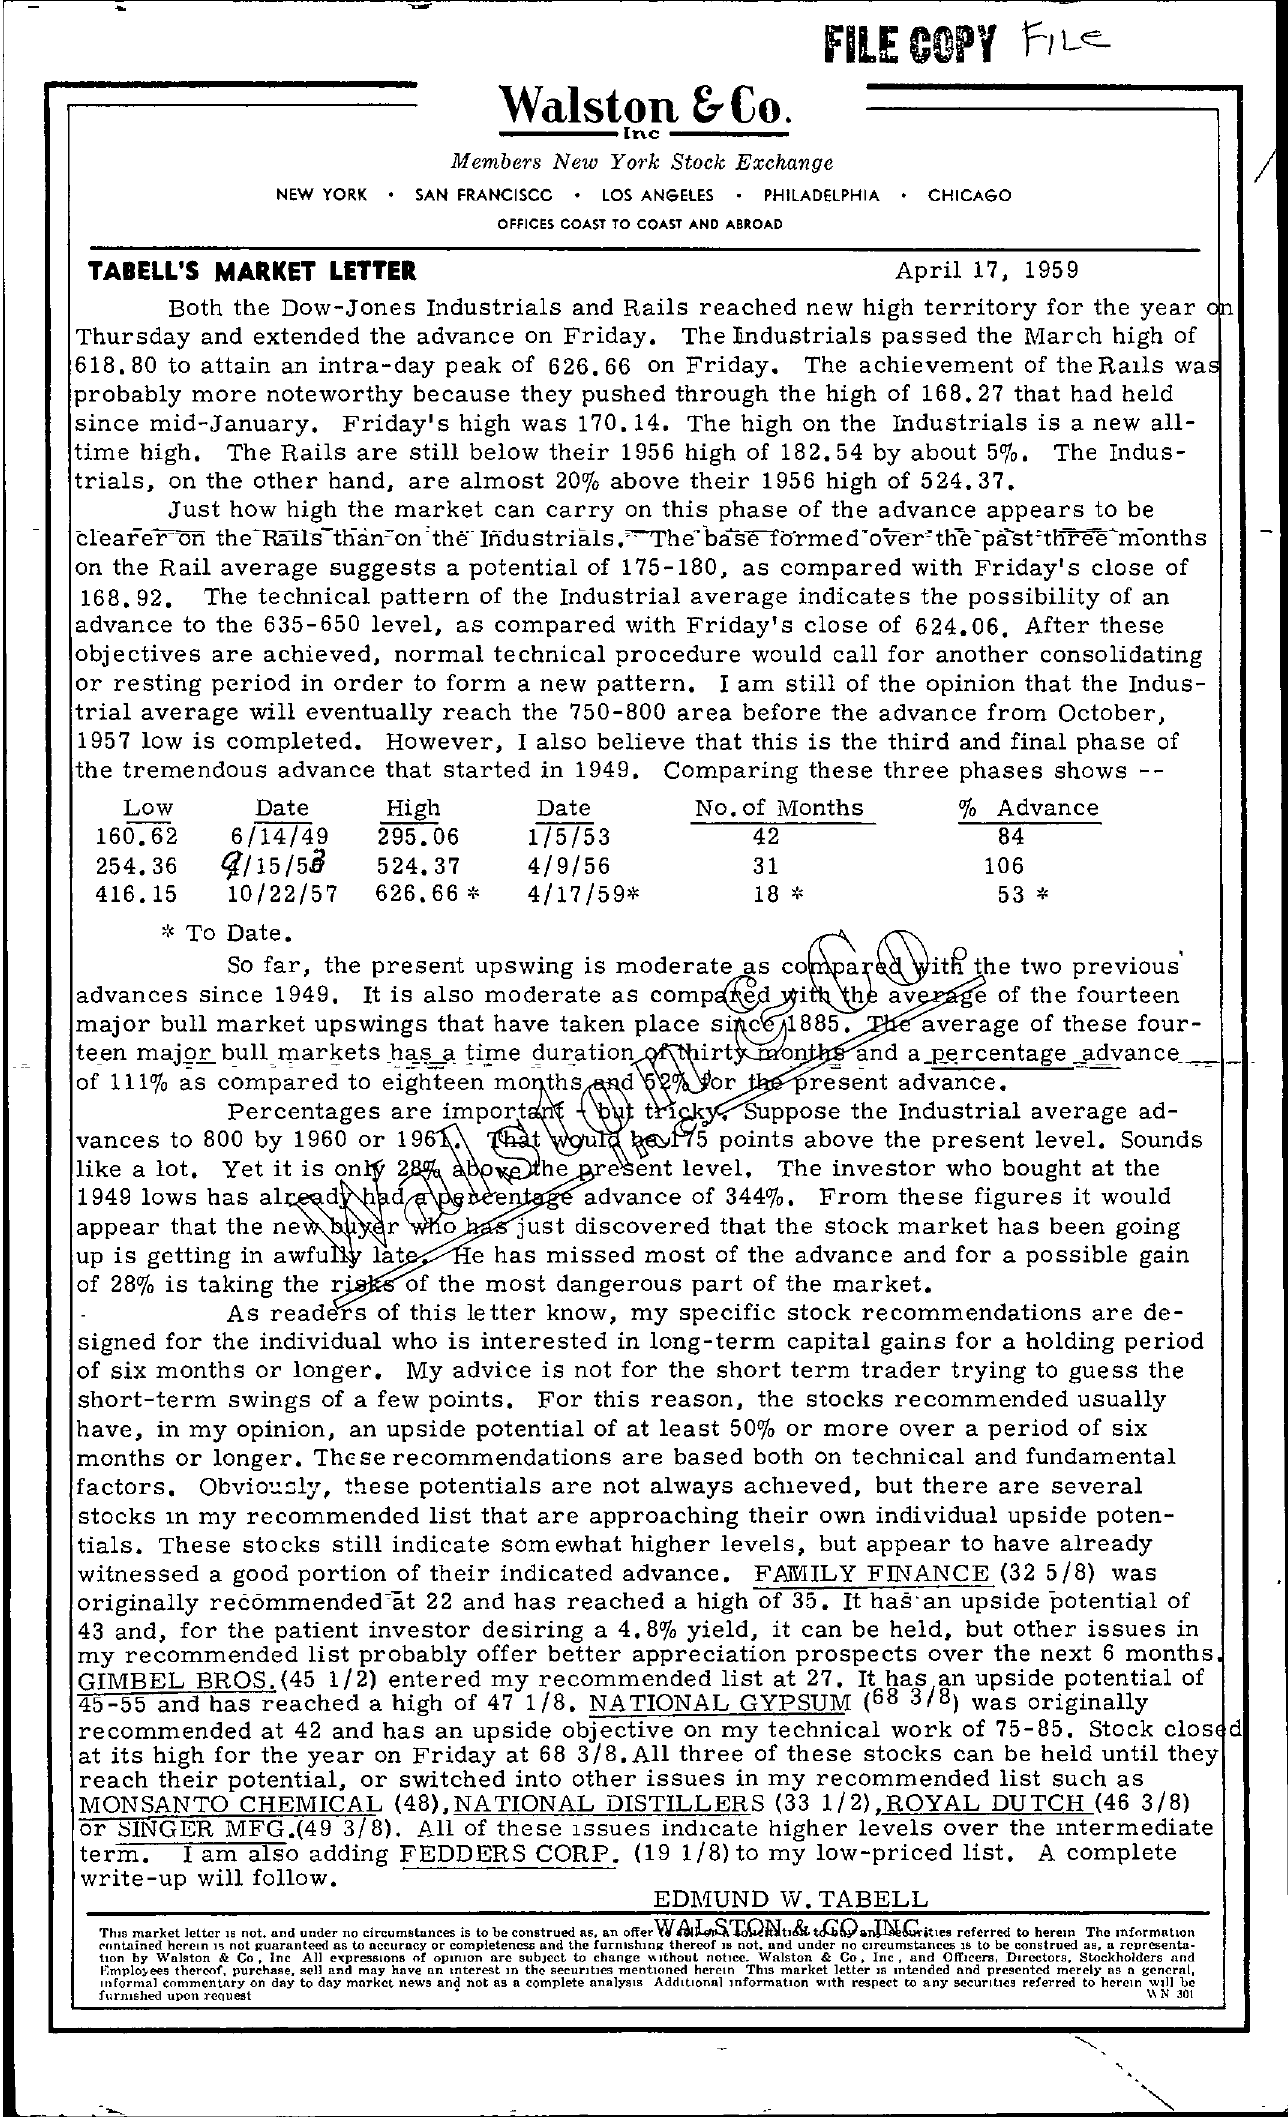 Tabell's Market Letter - April 17, 1959